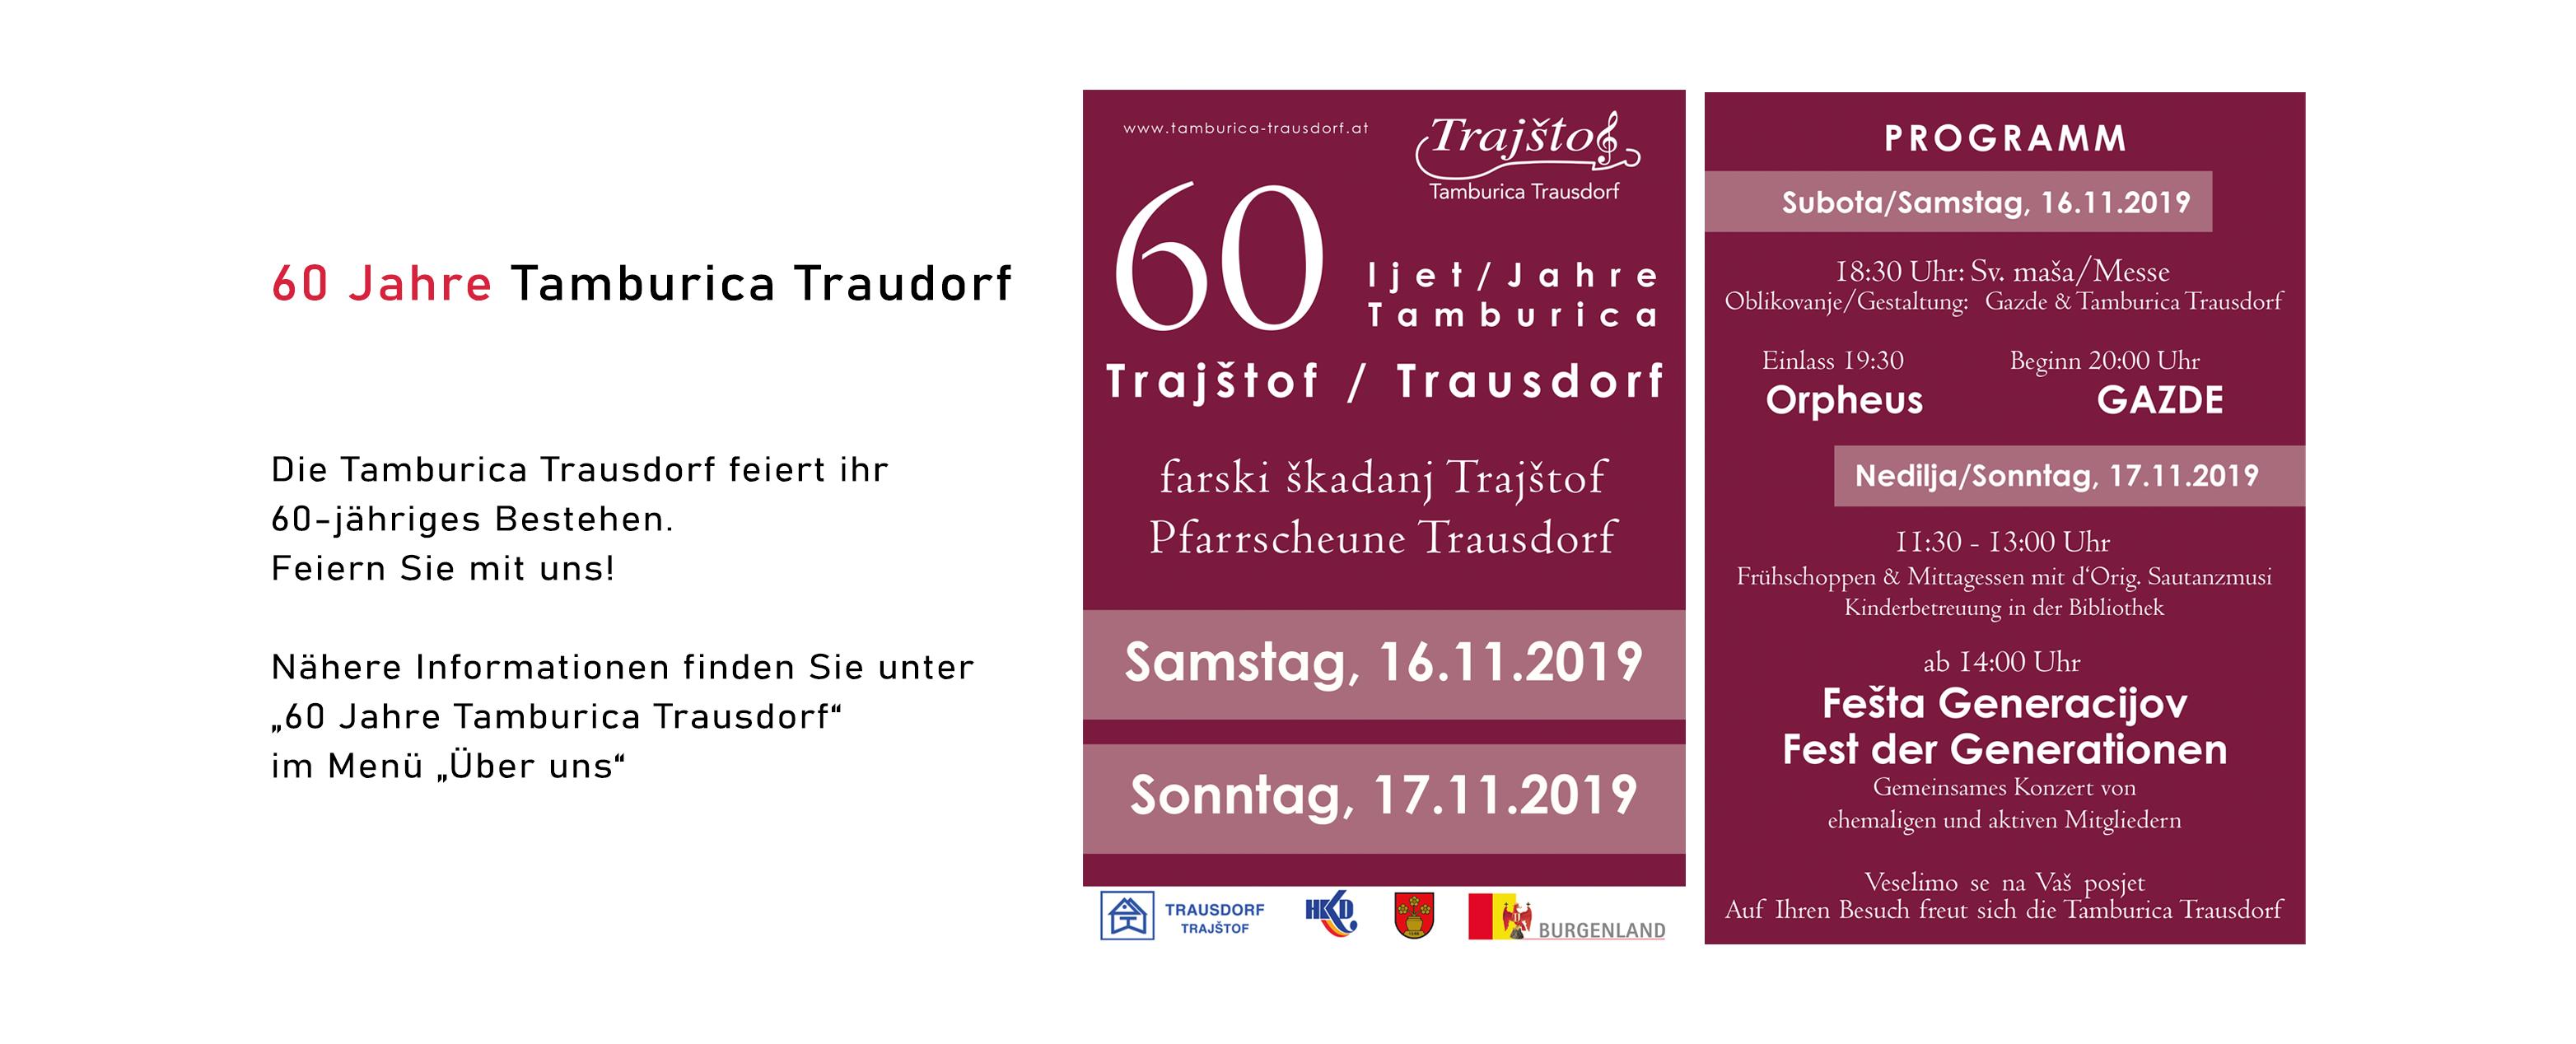 60 Jahre Tamburica Trausdorf